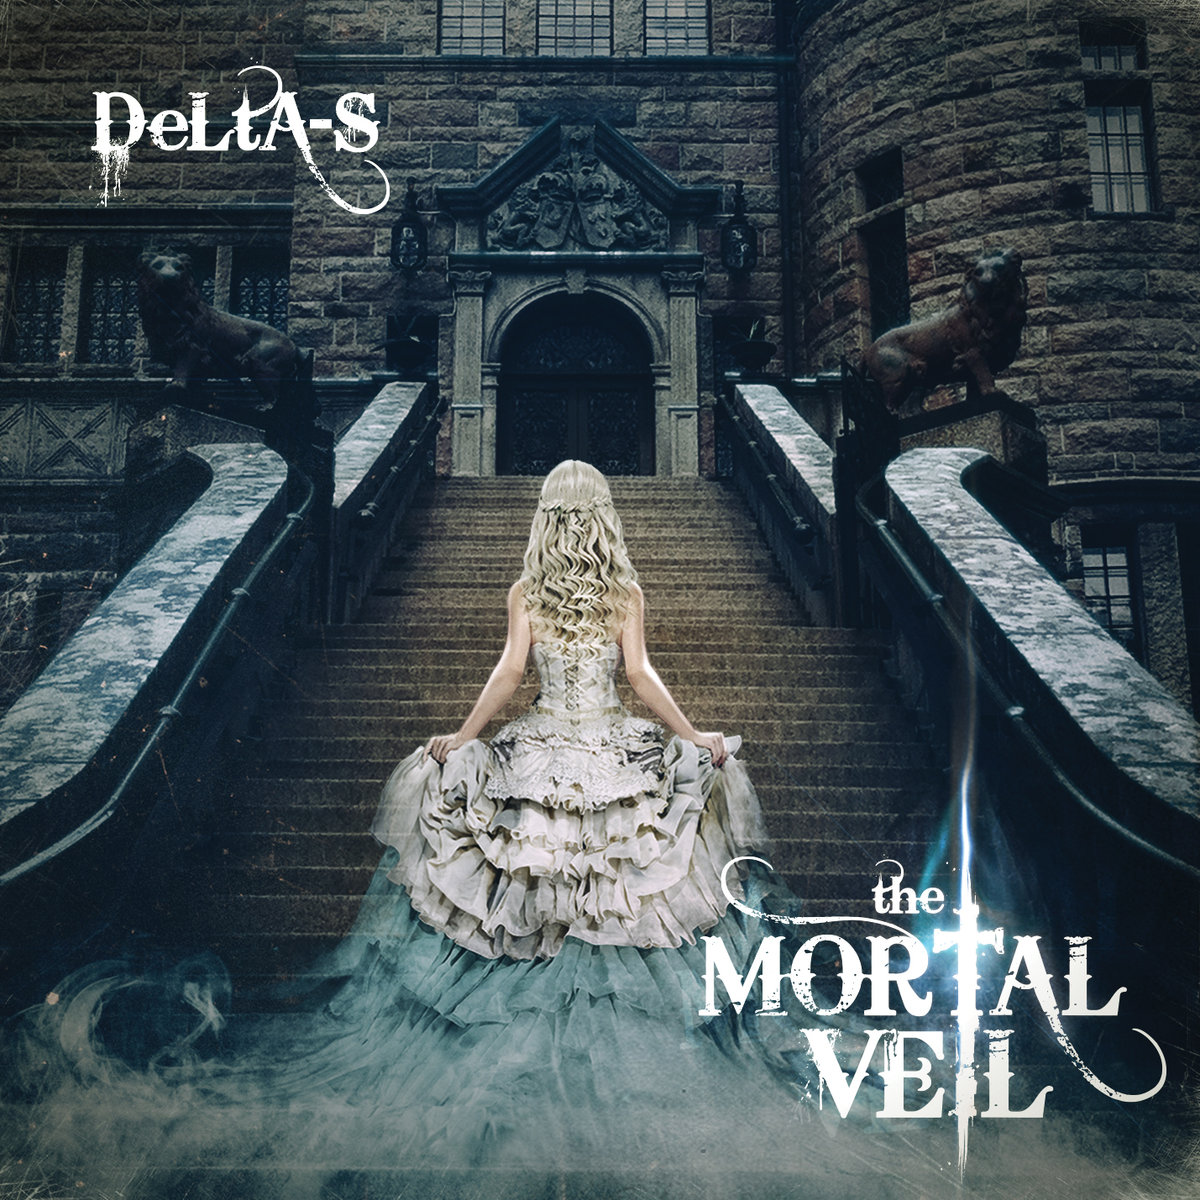 The Mortal Veil